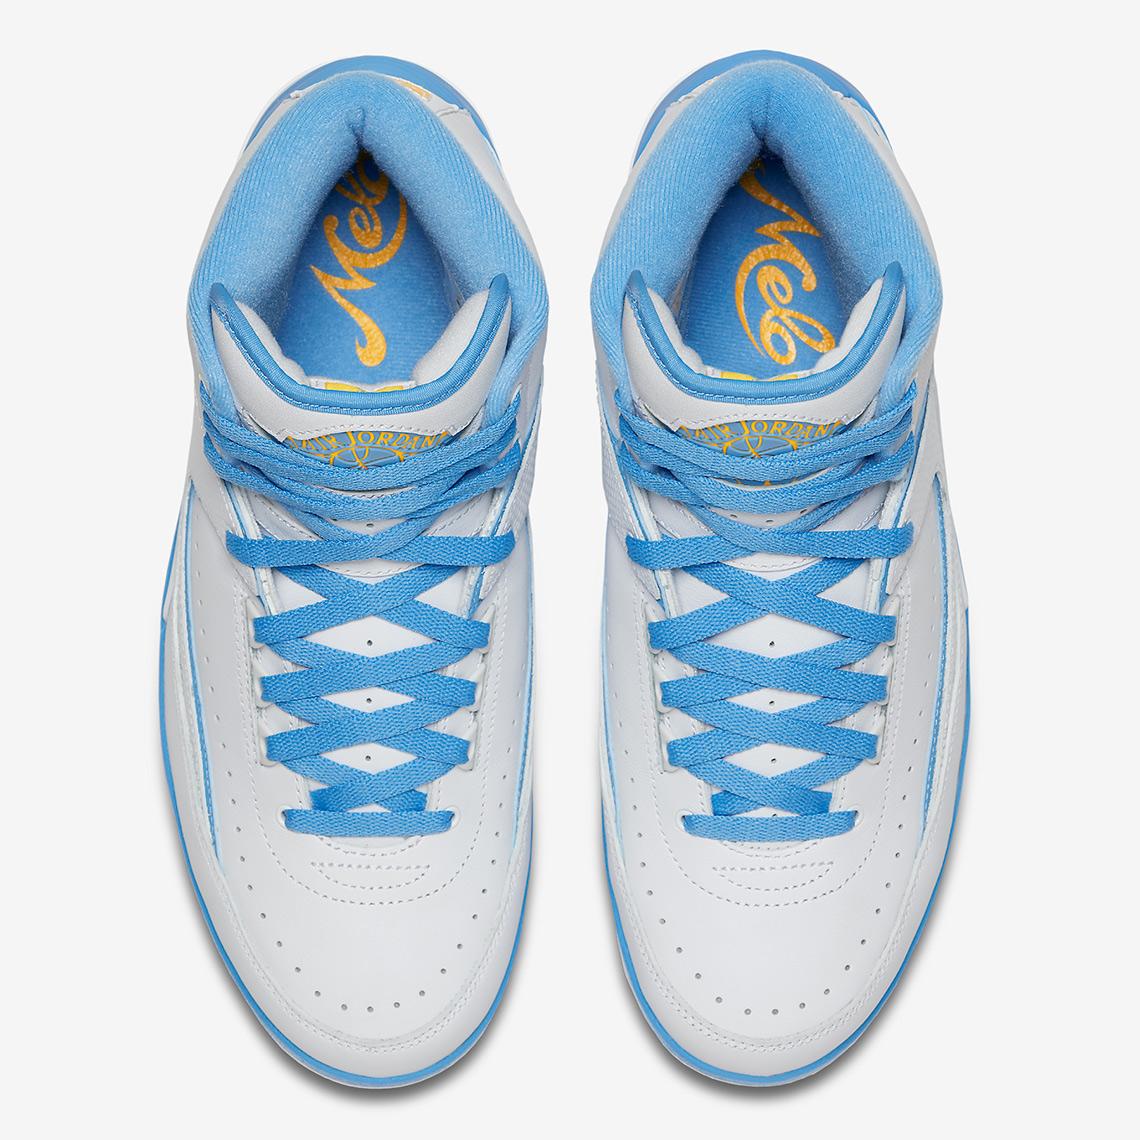 9f58e756f63ef8 ... White Varsity Maize University Blue 385475-122 Air Jordan 2 Melo  Release Date June 9th